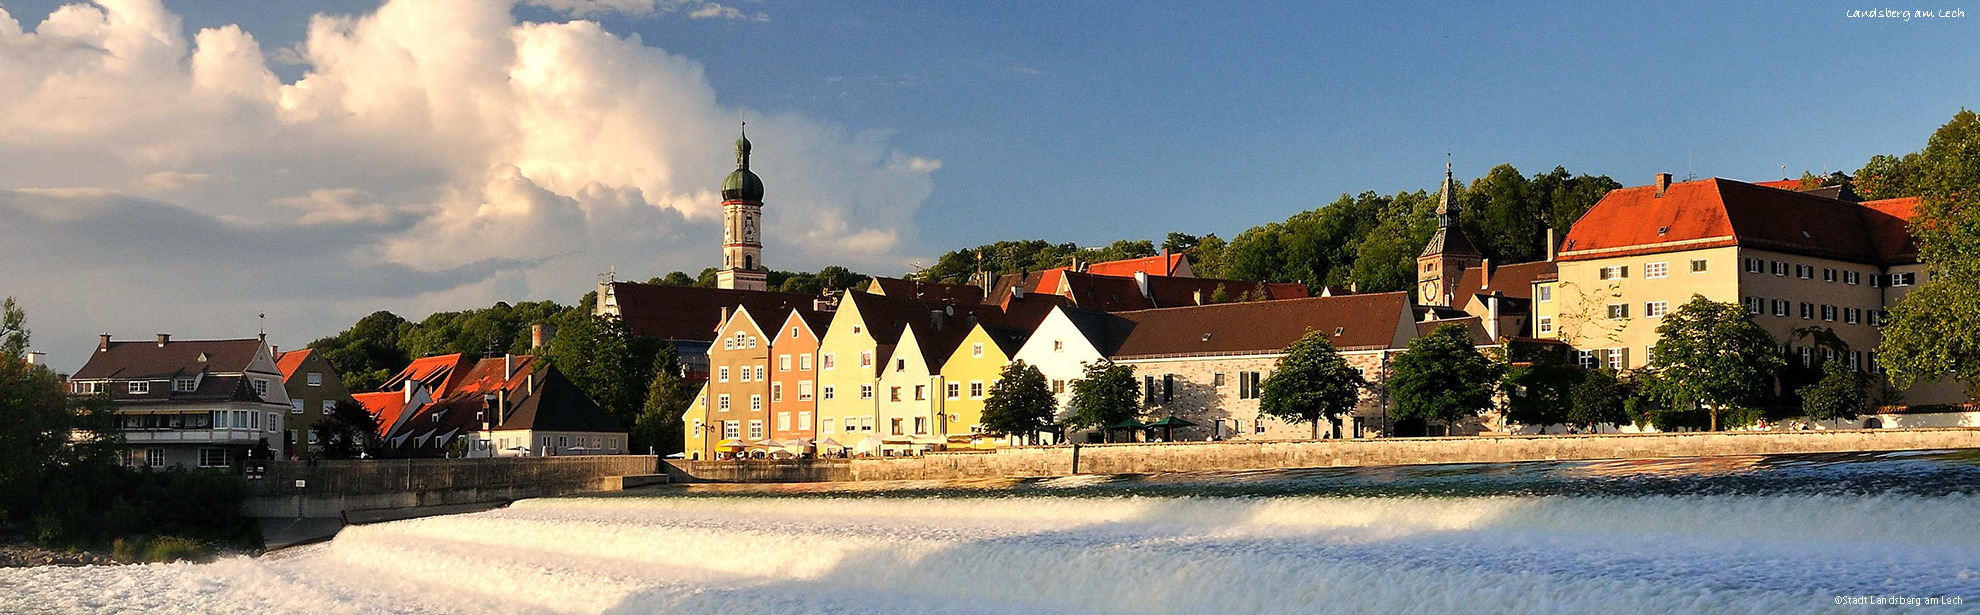 OklassStadt-Landsberg-aL_Lechwehr_D3C0124